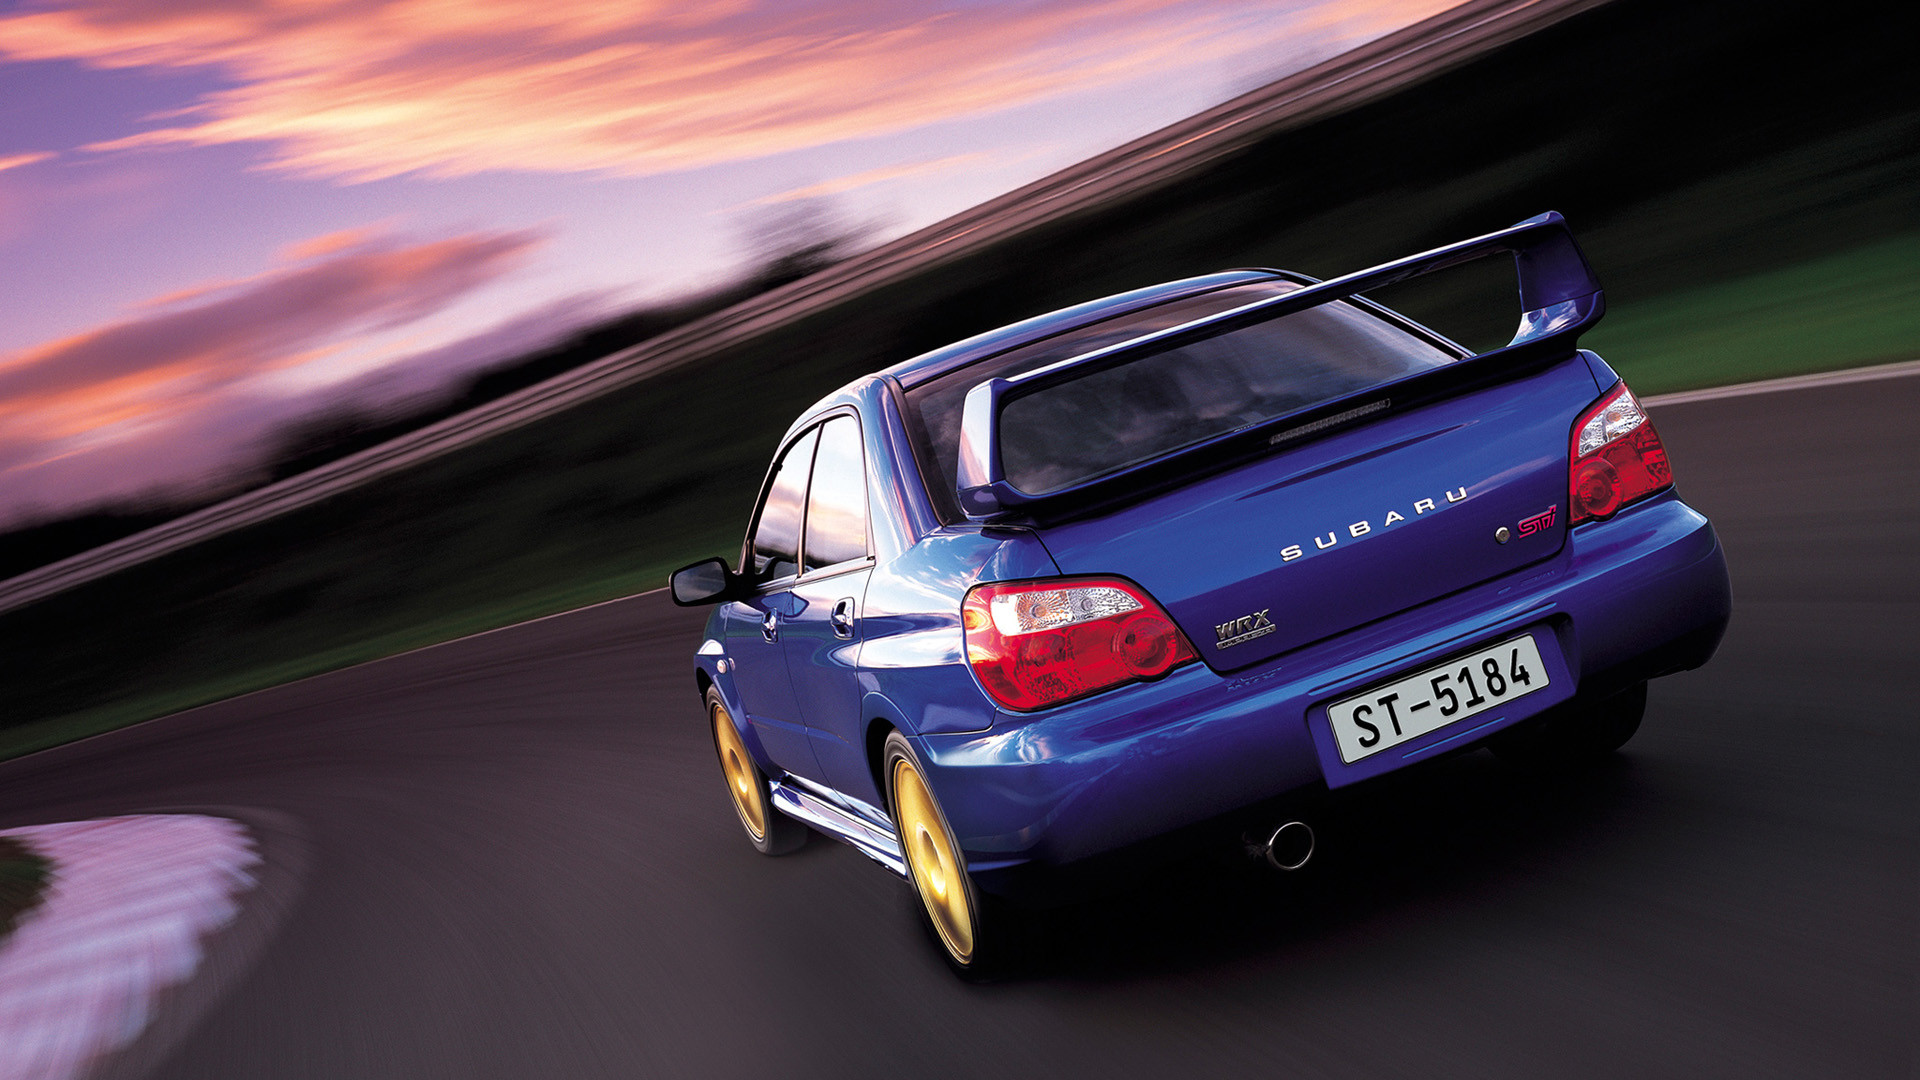 Subaru Impreza Wrx Sti Wallpaper 68 Pictures